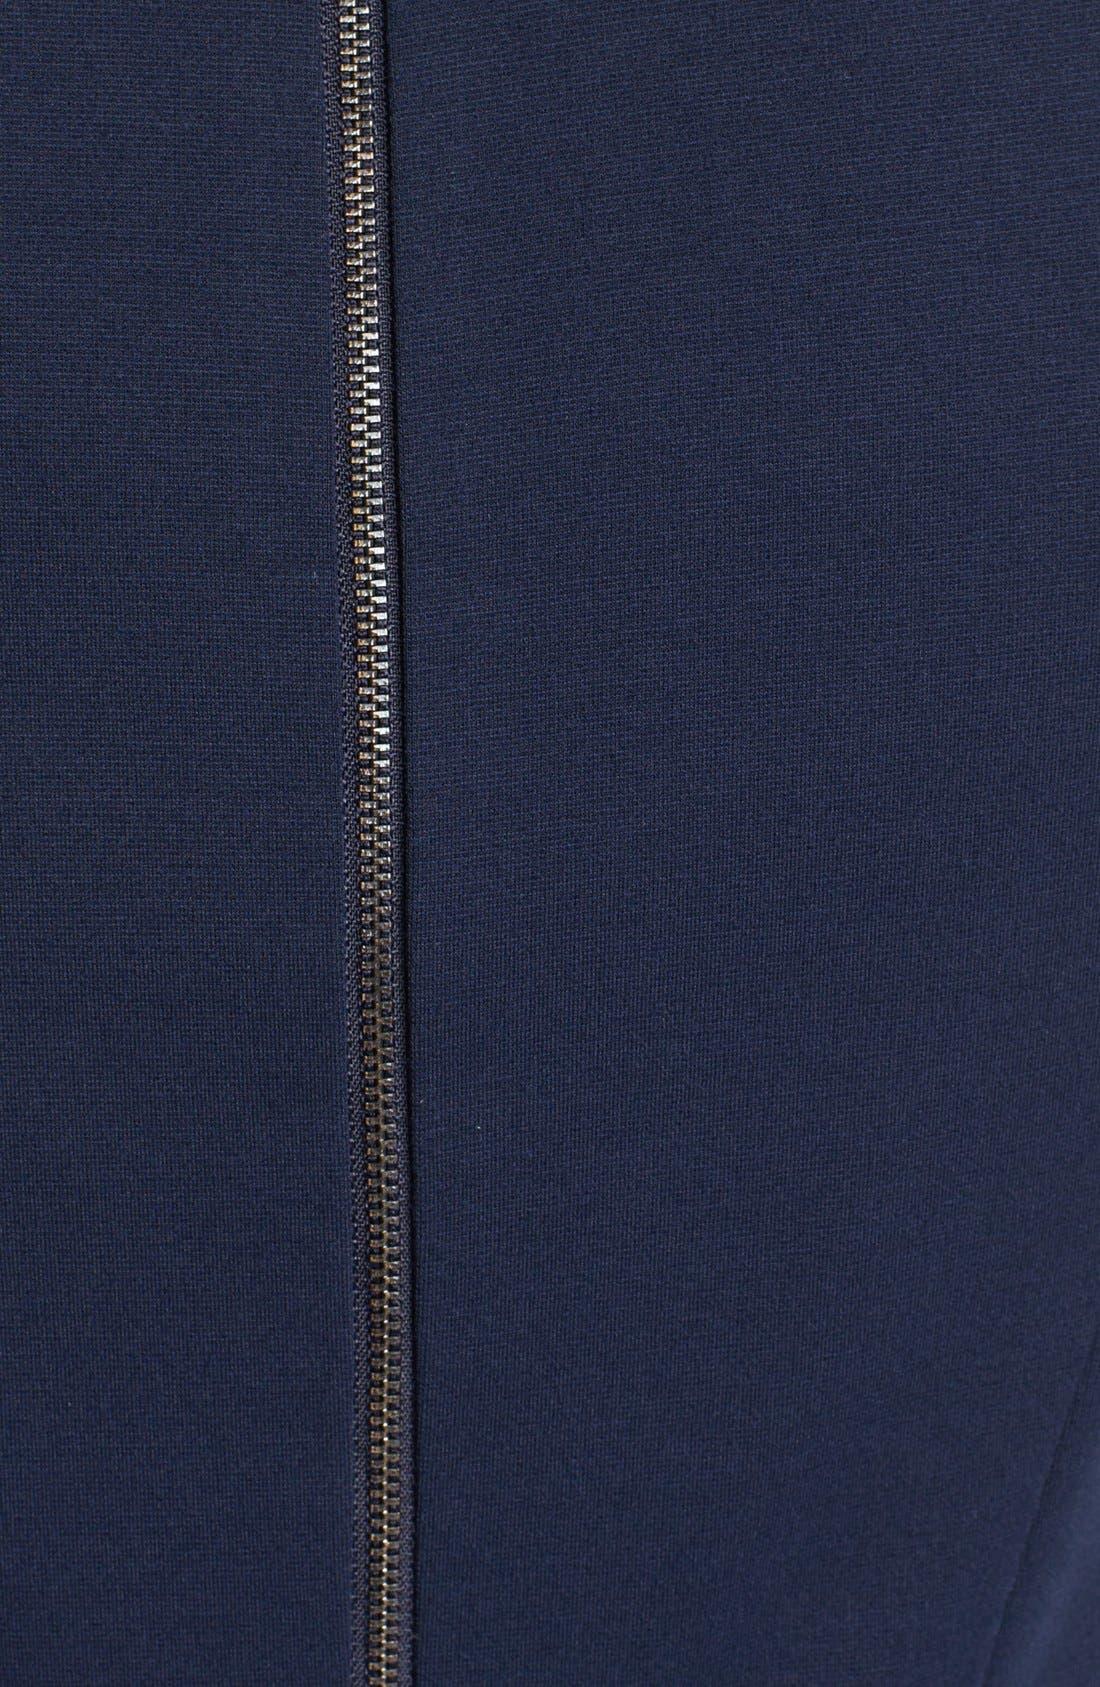 Alternate Image 3  - Anne Klein Belted Fit & Flare Dress